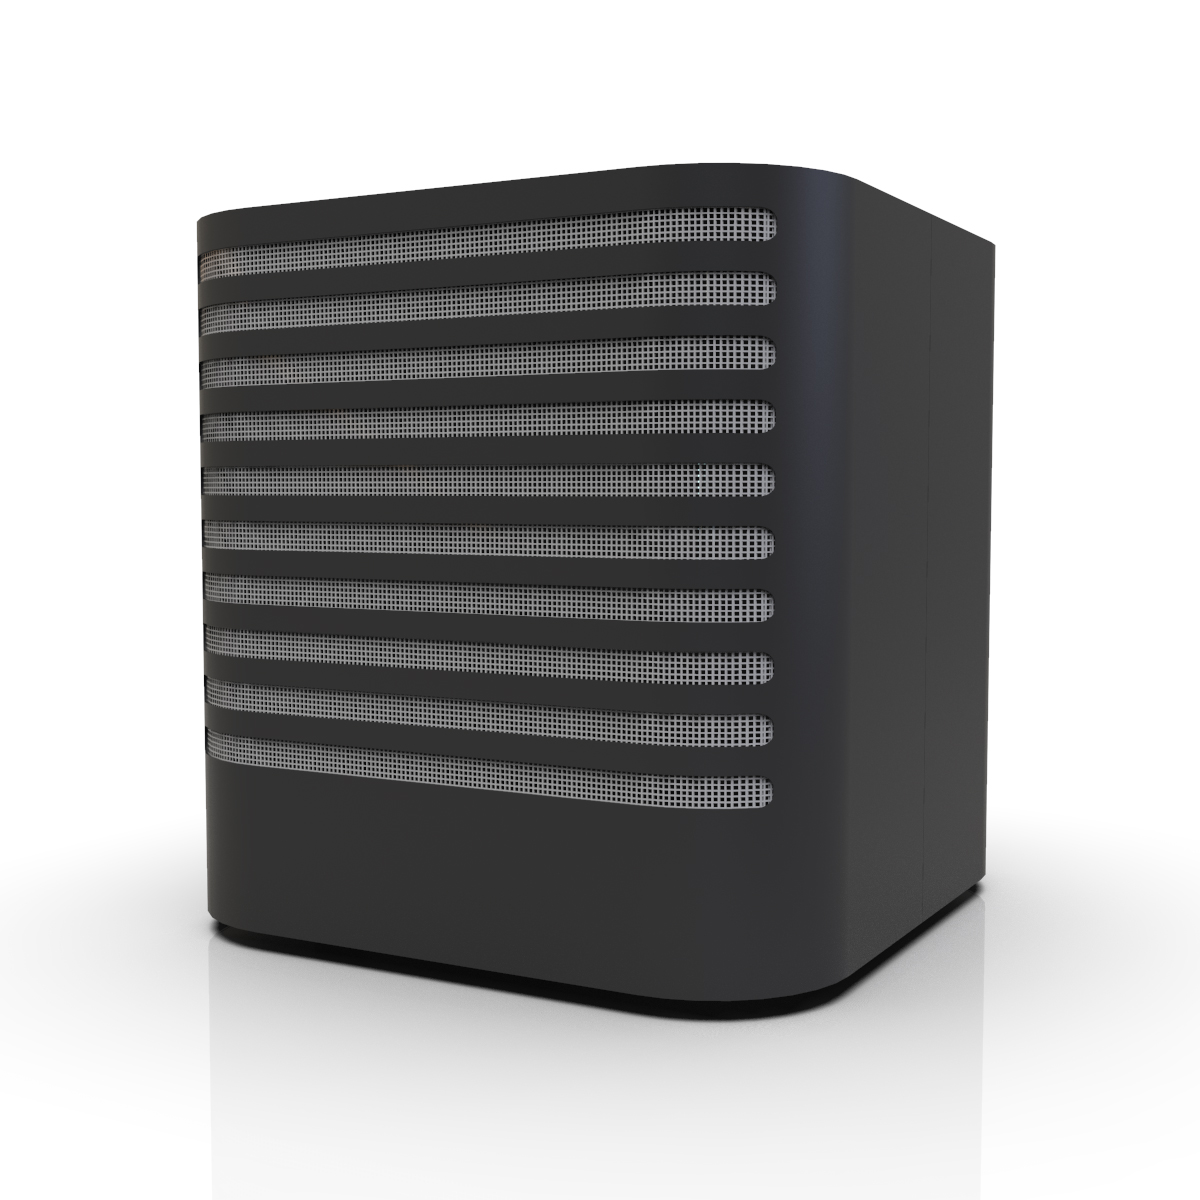 Дизайн корпуса очистителя воздуха фото f_6015ec35633b965a.jpg